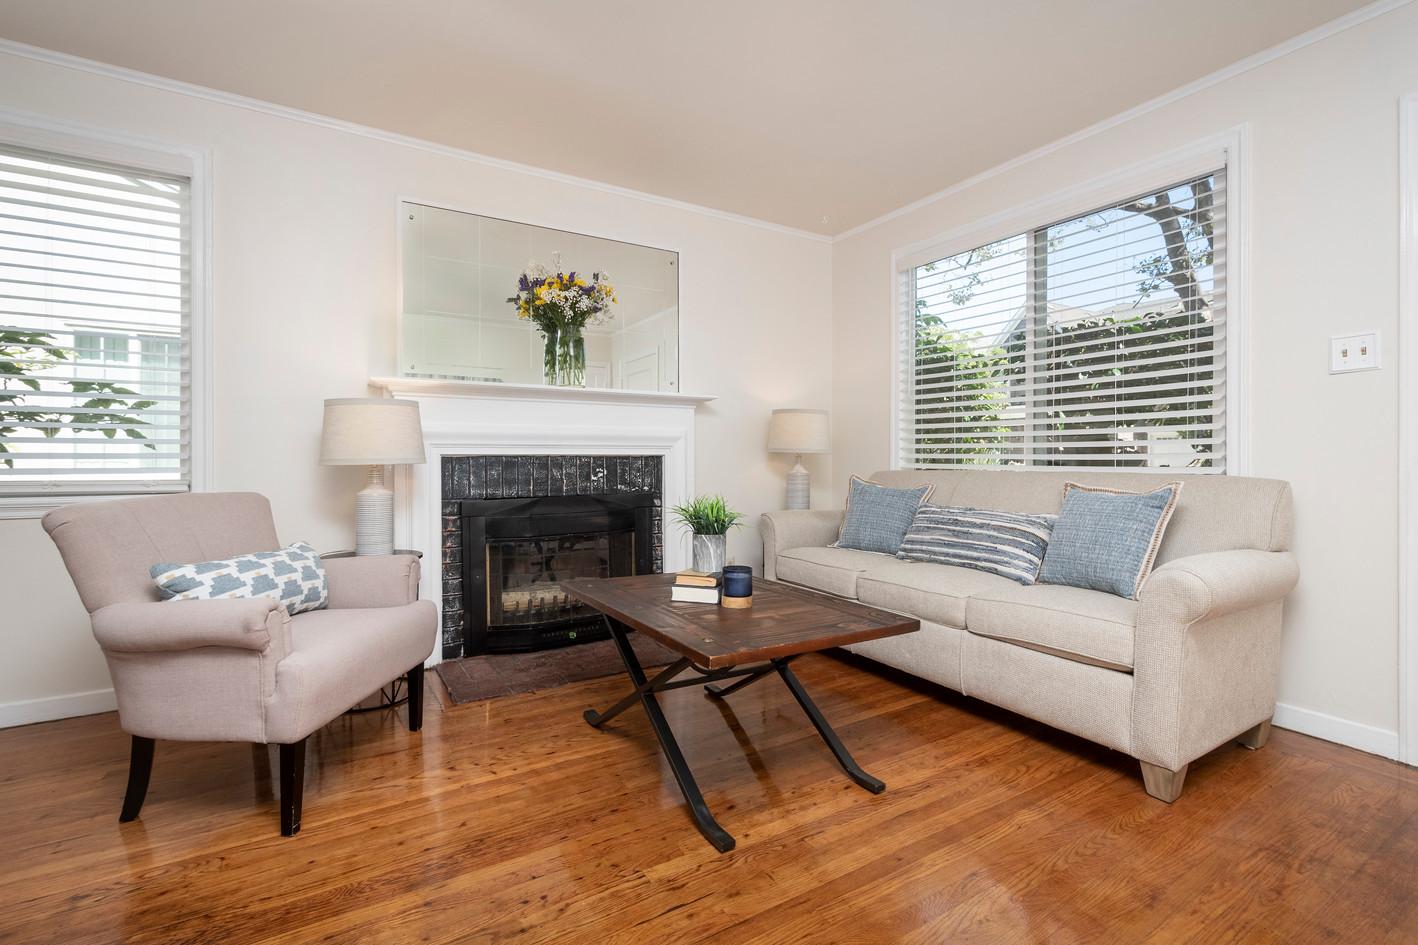 05 - Living Room (1010) - 1010-1012 S Id